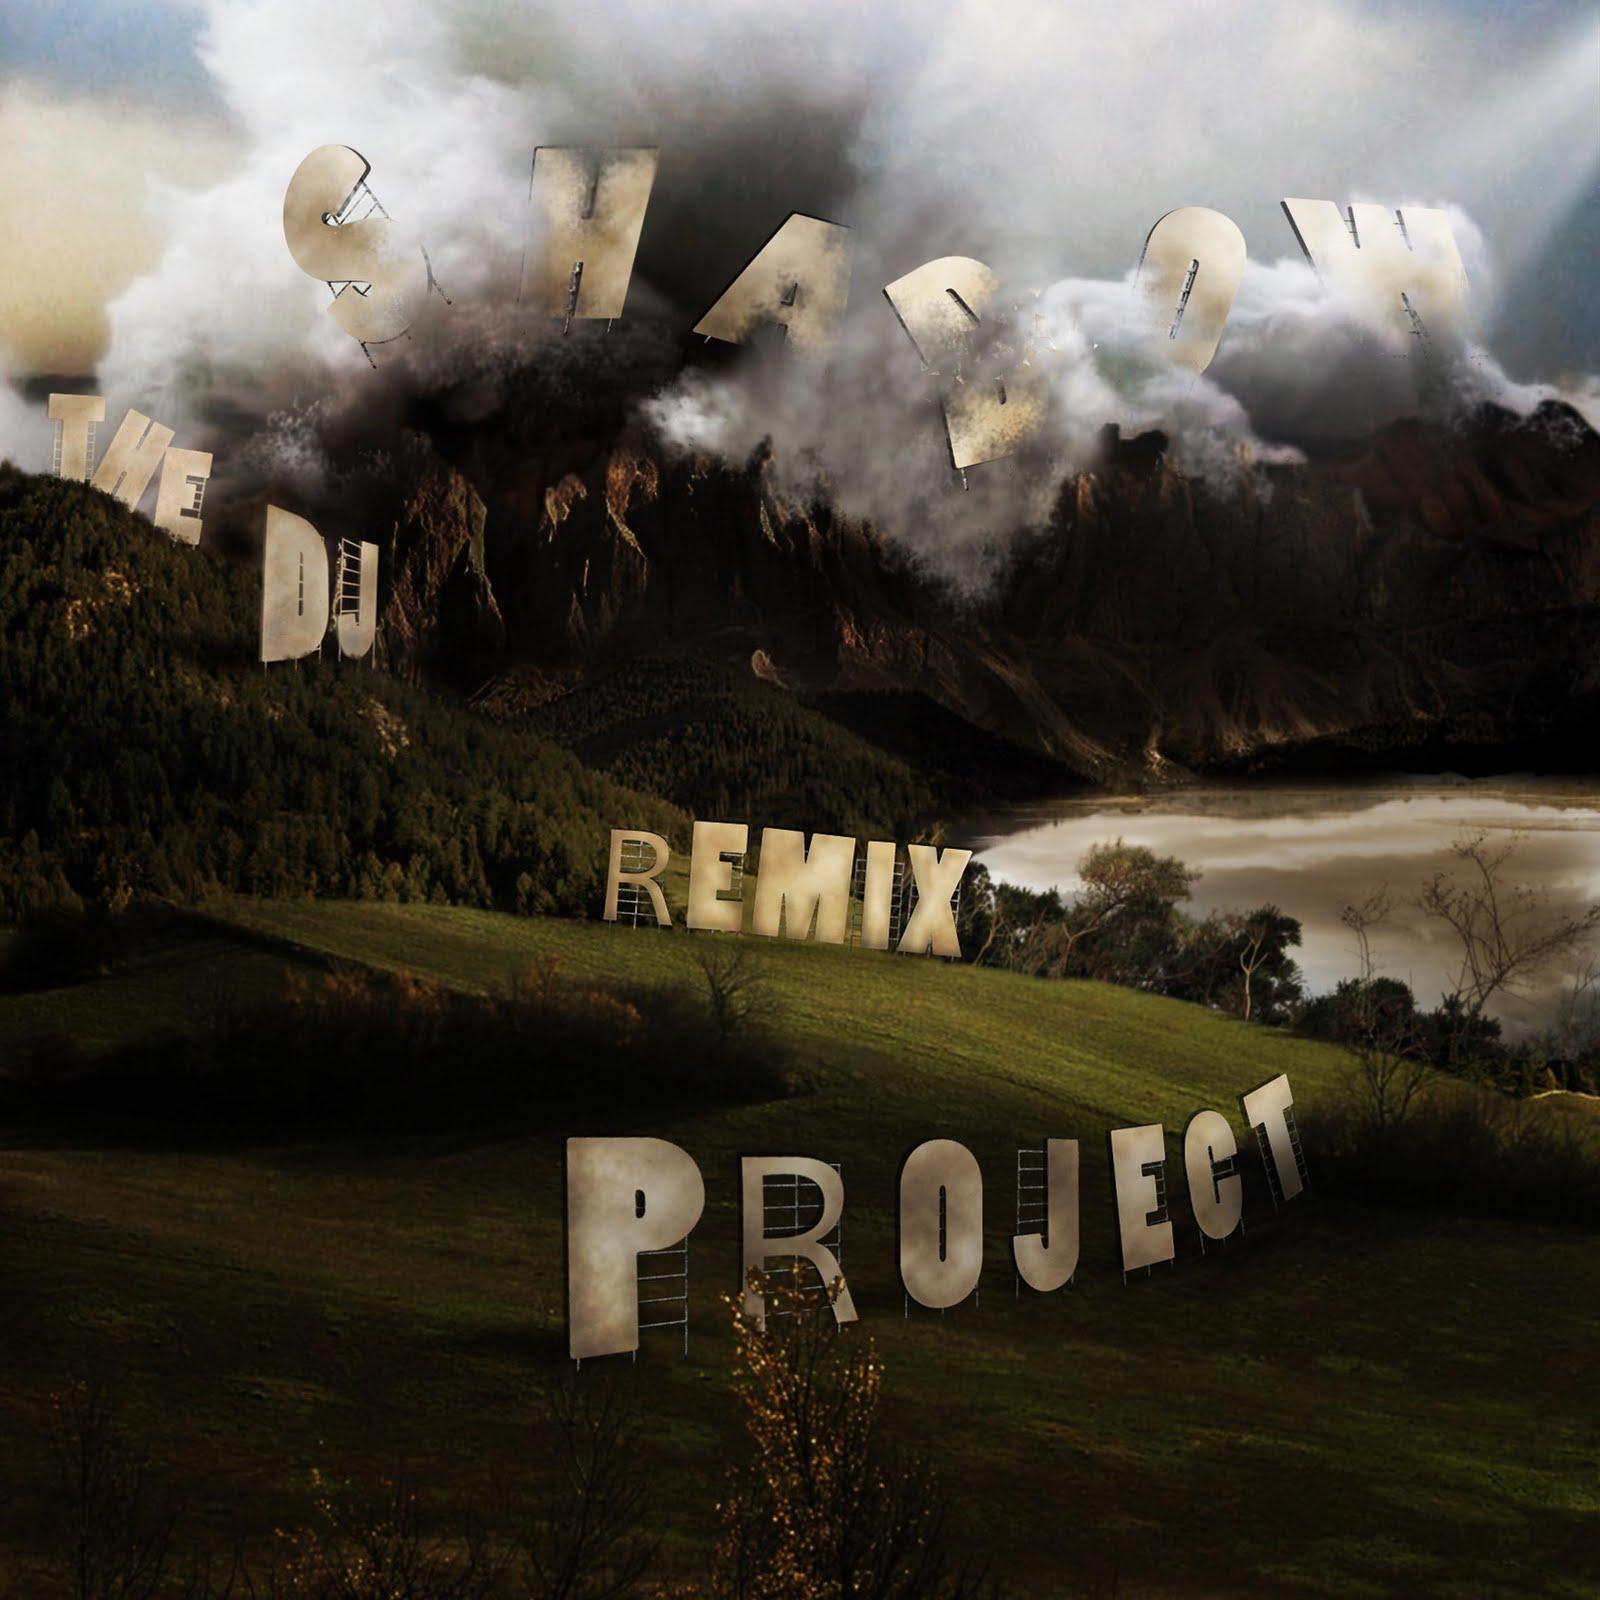 http://1.bp.blogspot.com/_bU_4T1FKKIU/THESm--i-qI/AAAAAAAAACE/wGXunKu2u7s/s1600/CD+dj+shadow+front+cover+J-S.jpg